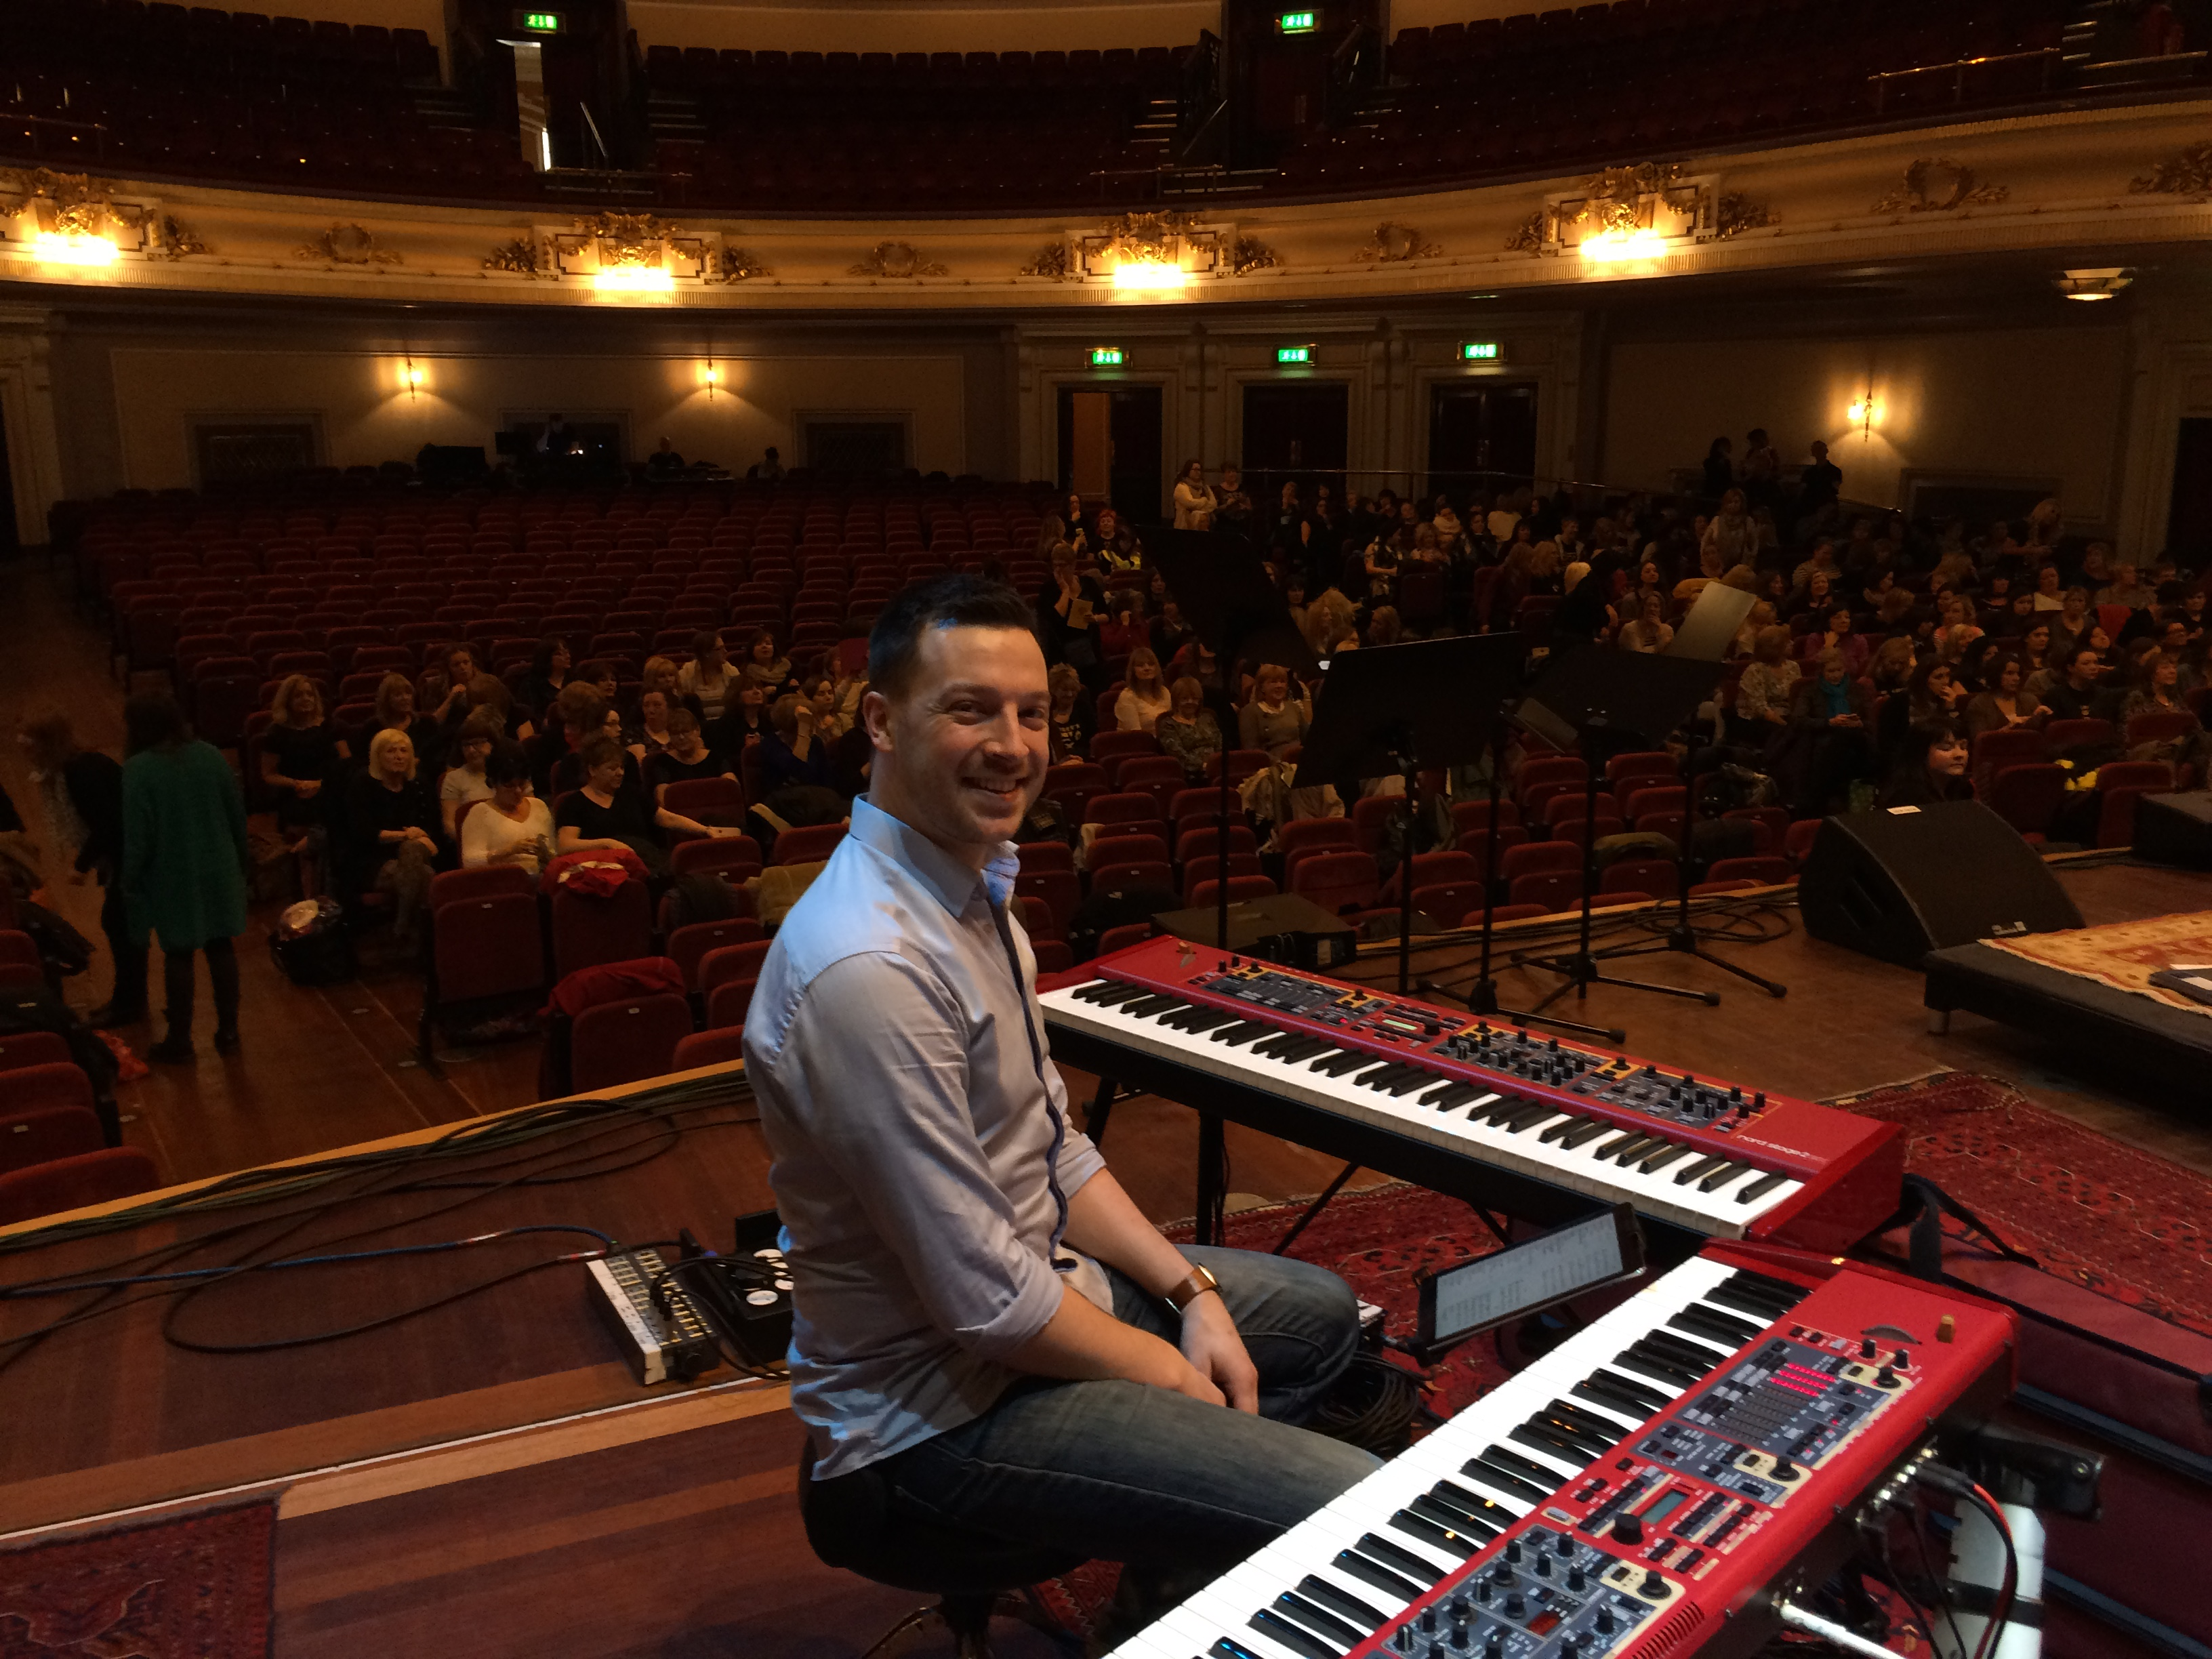 Rob at the Usher Hall